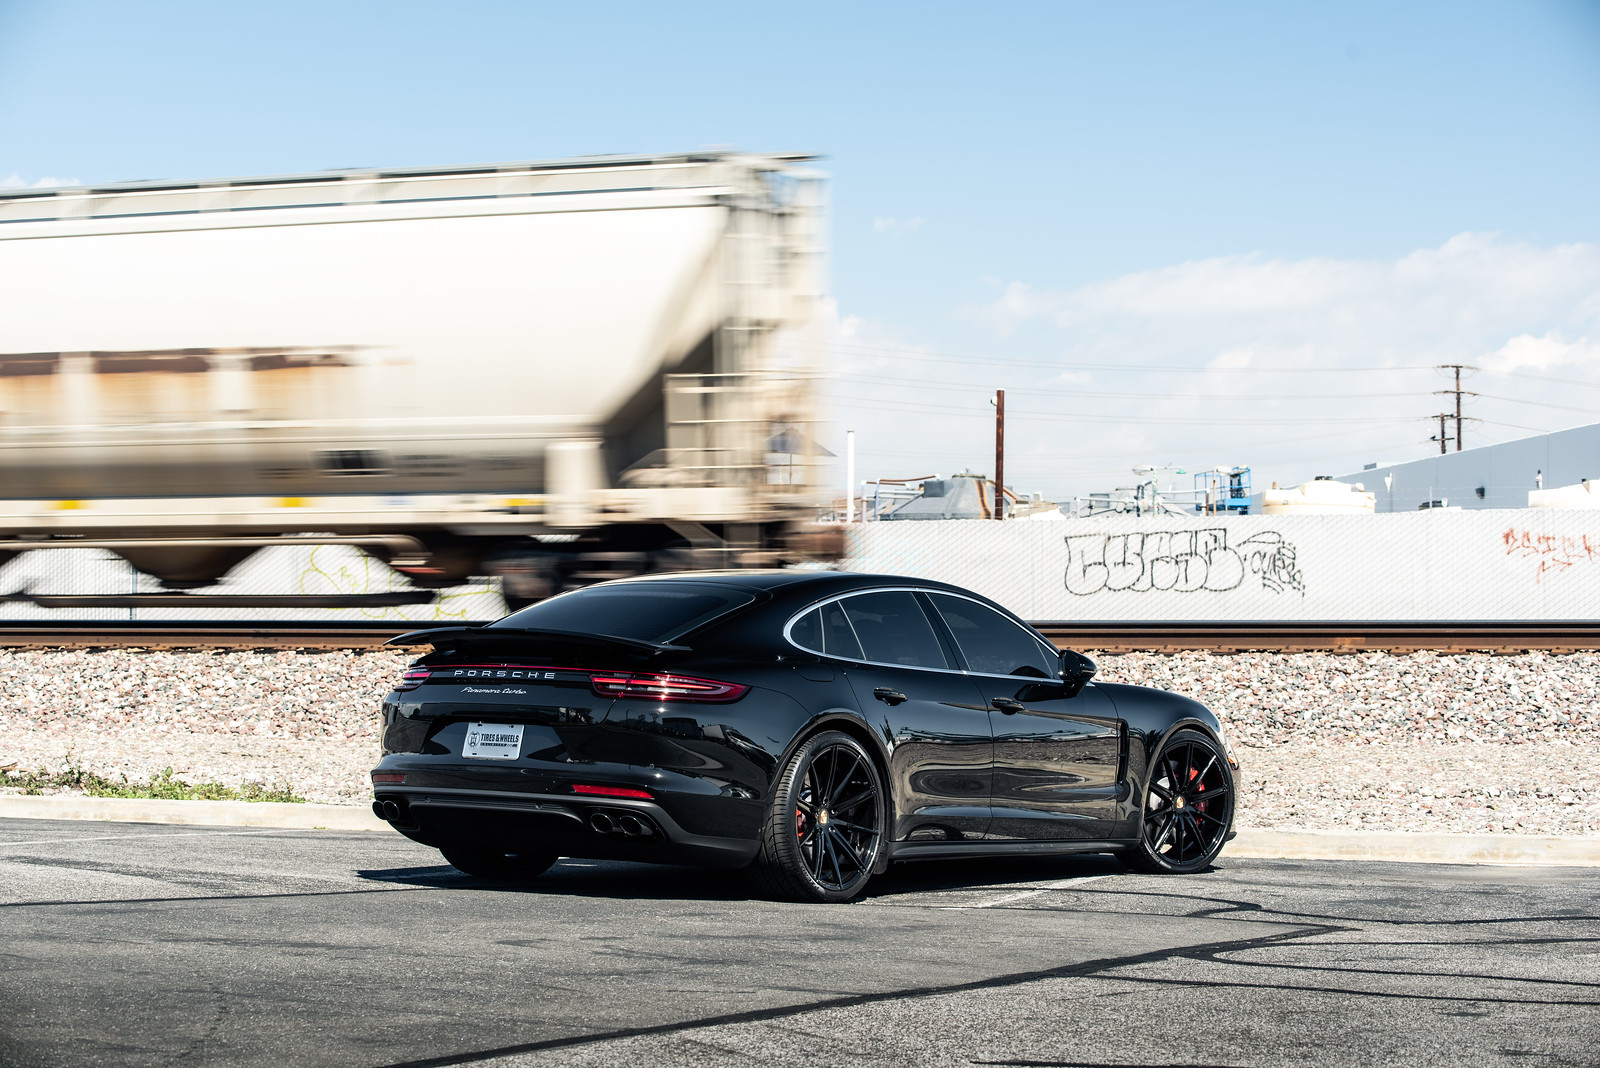 2019_Porsche_Panamera_Turbo_BD9_BlackWhite (13)